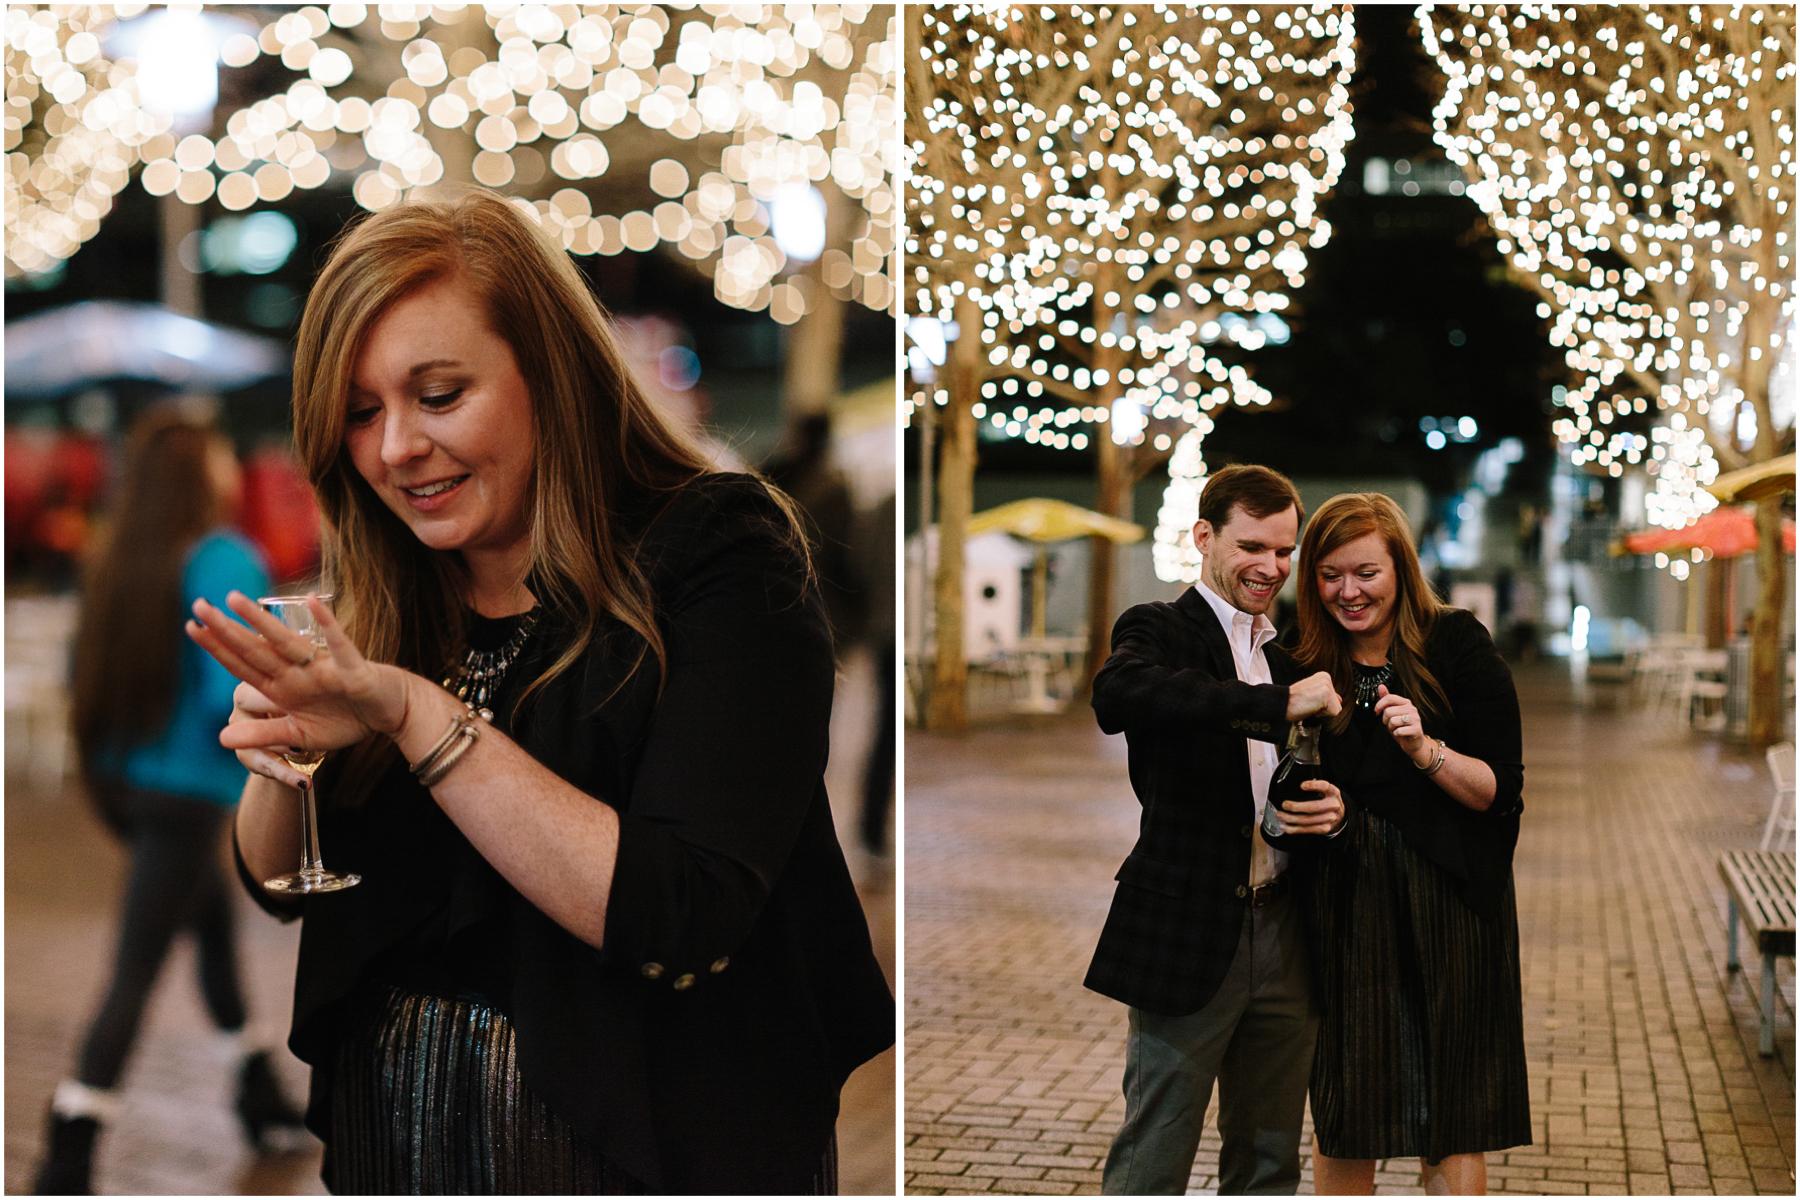 alyssa barletter photography crown center kansas city wedding proposal how he asked-4.jpg